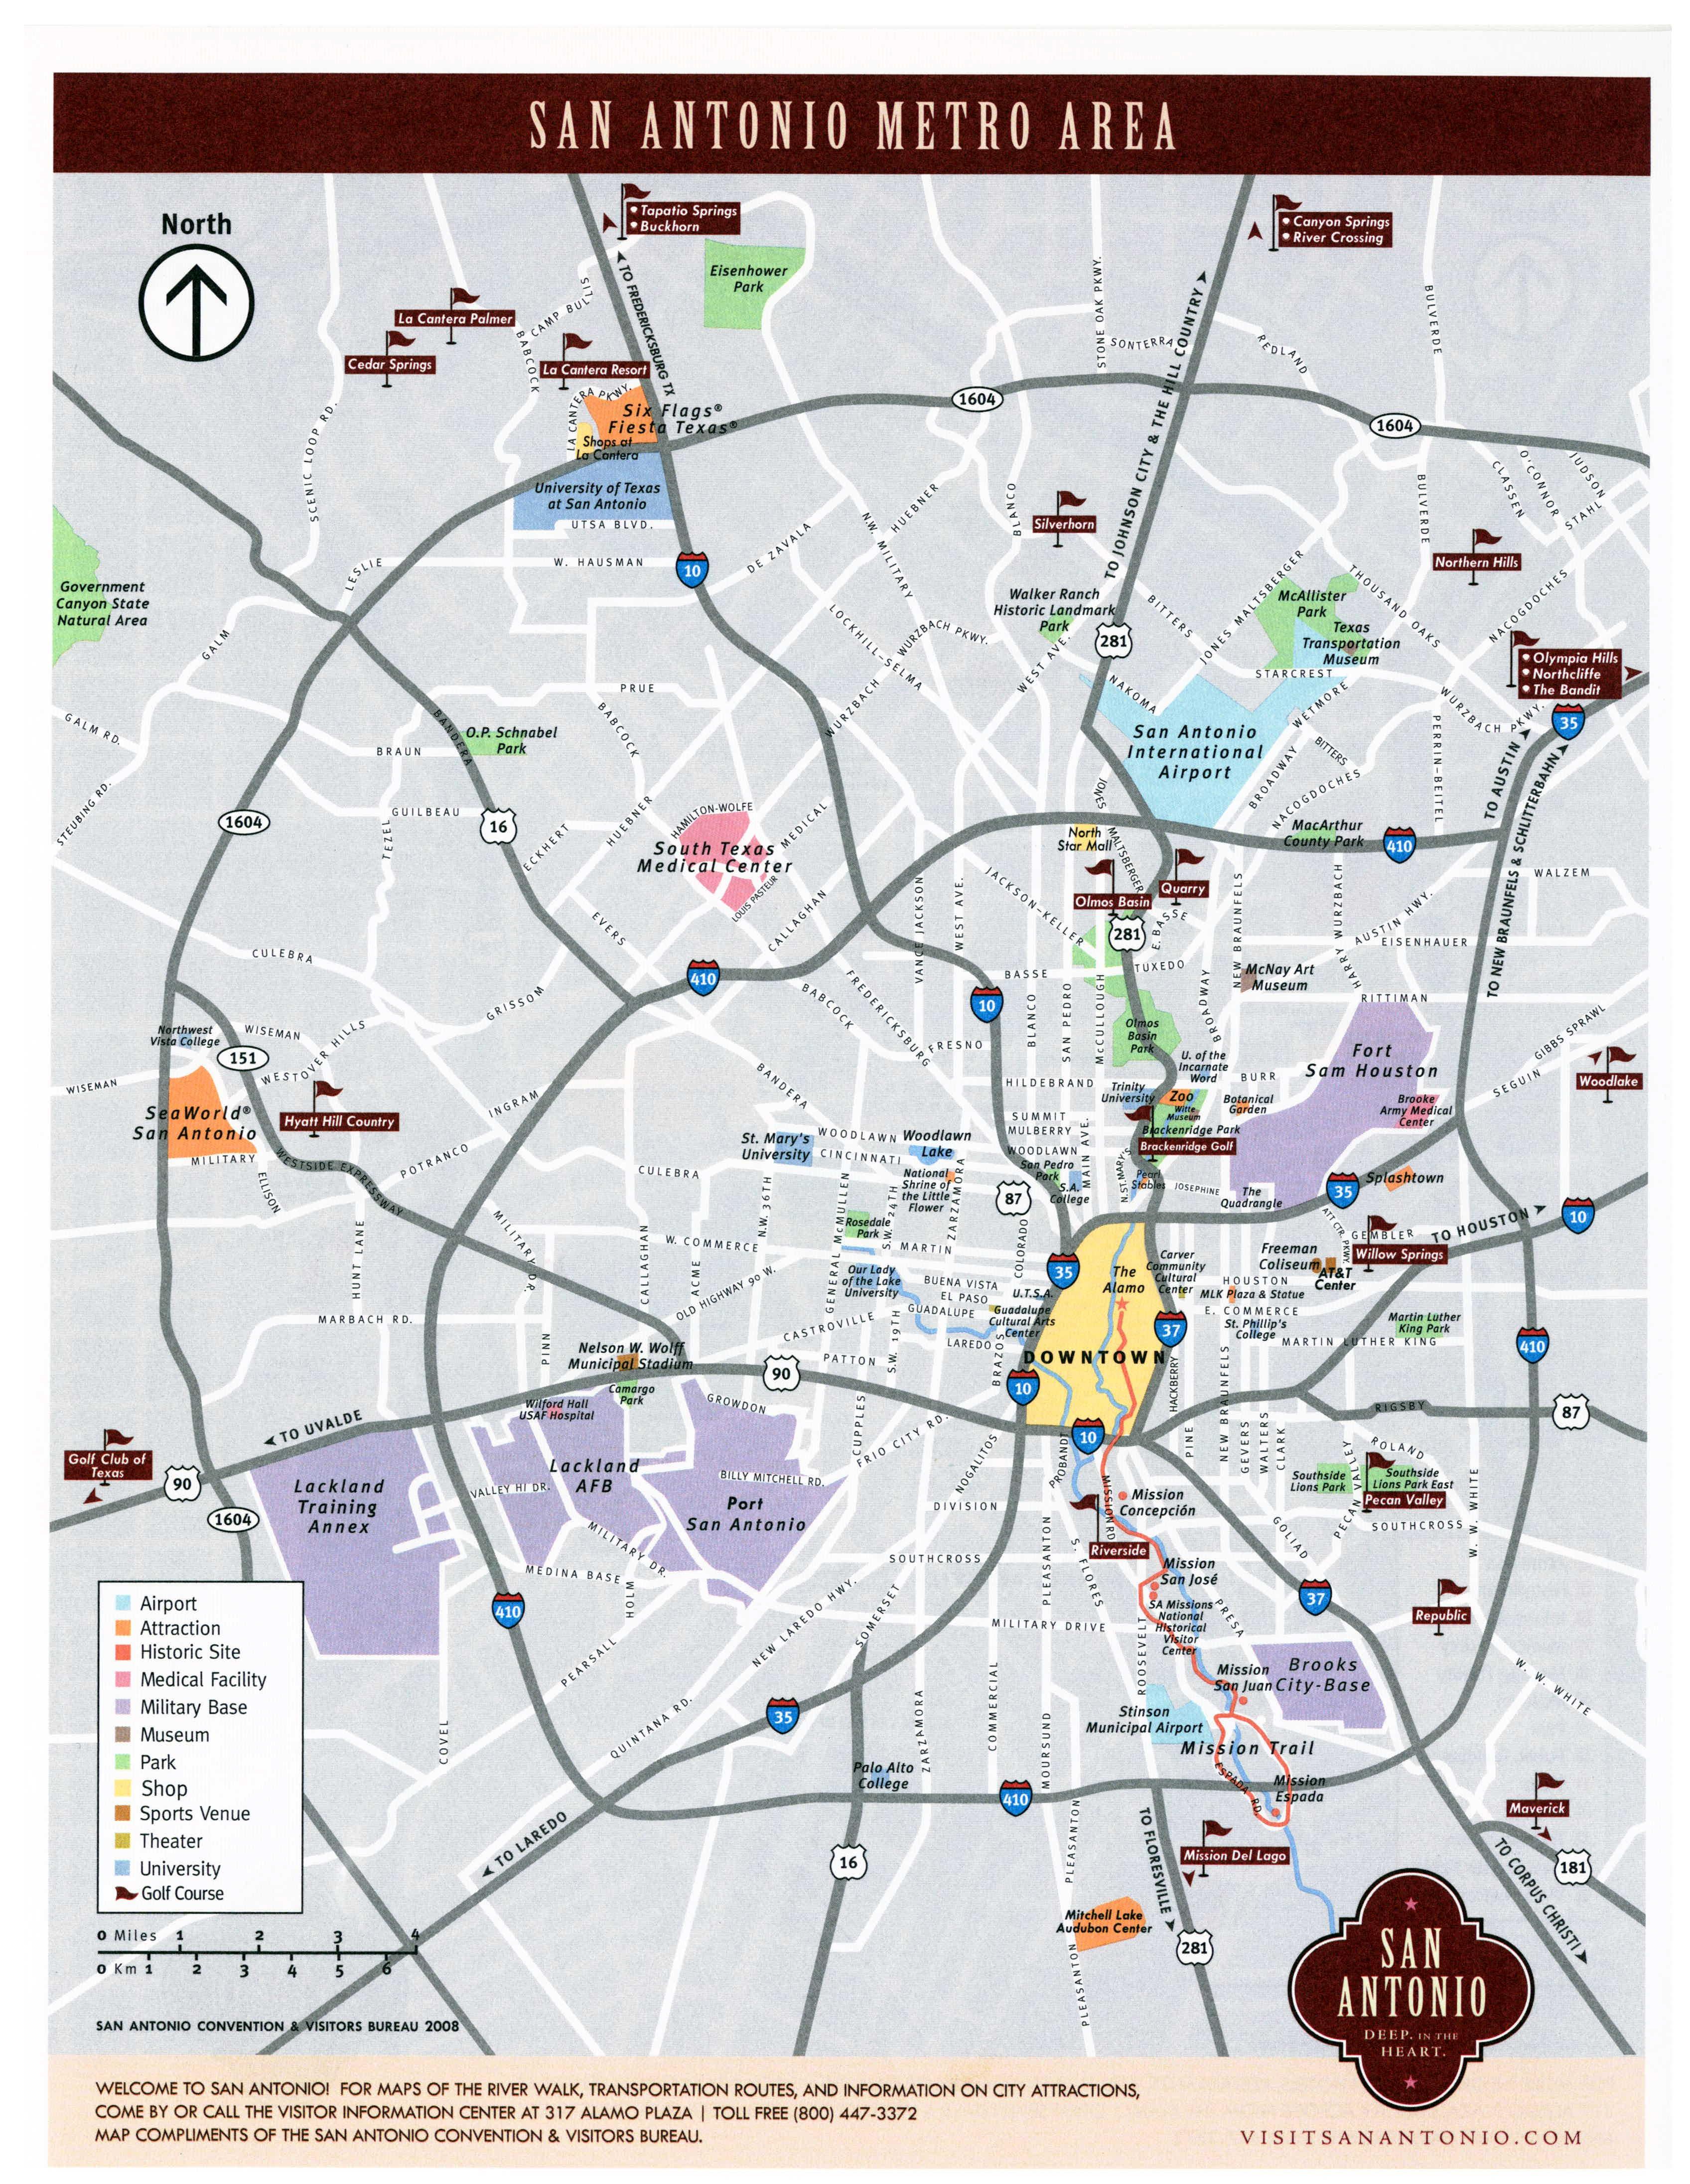 Large San Antonio Maps For Free Download And Print | High-Resolution - Seaworld San Antonio Printable Map